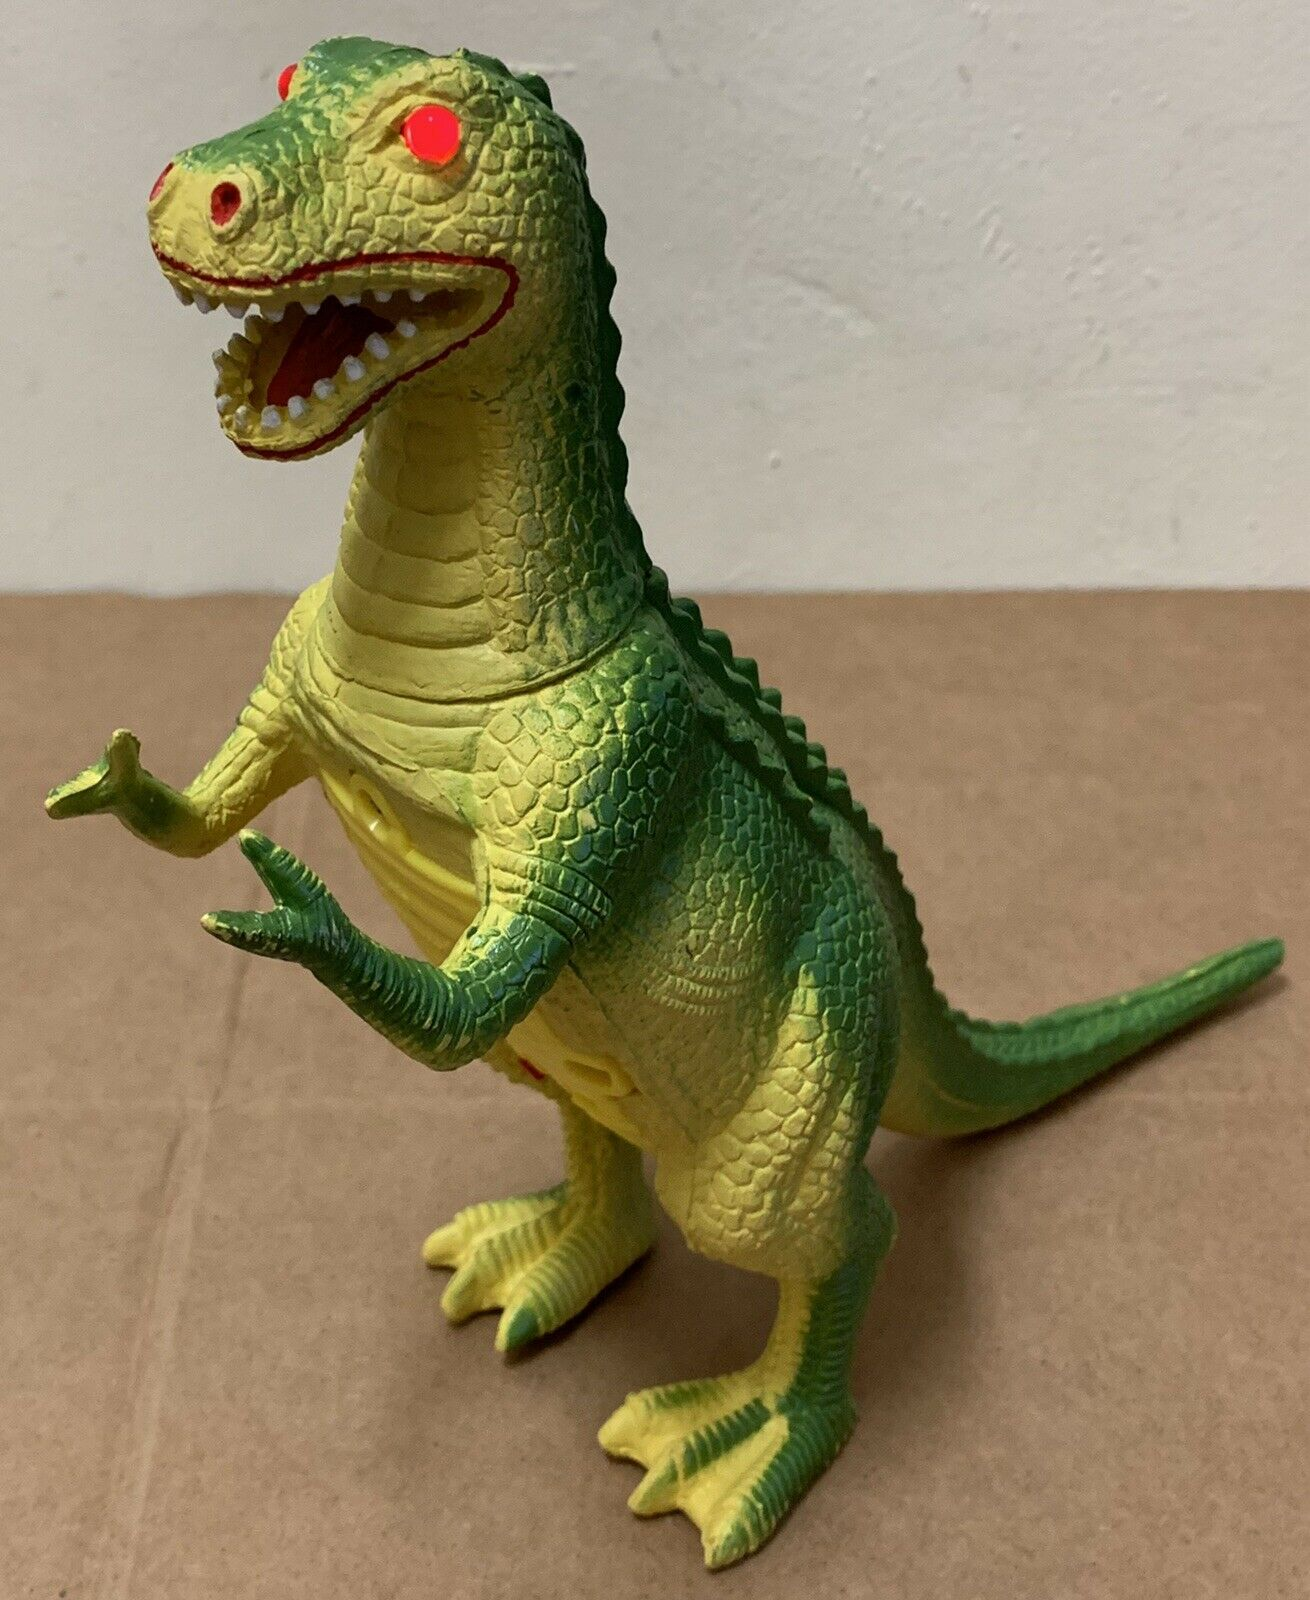 Rare Vintage Imperial Dinosaur Working rot Eyes & Sound Tyrannosaurus Rex 1990